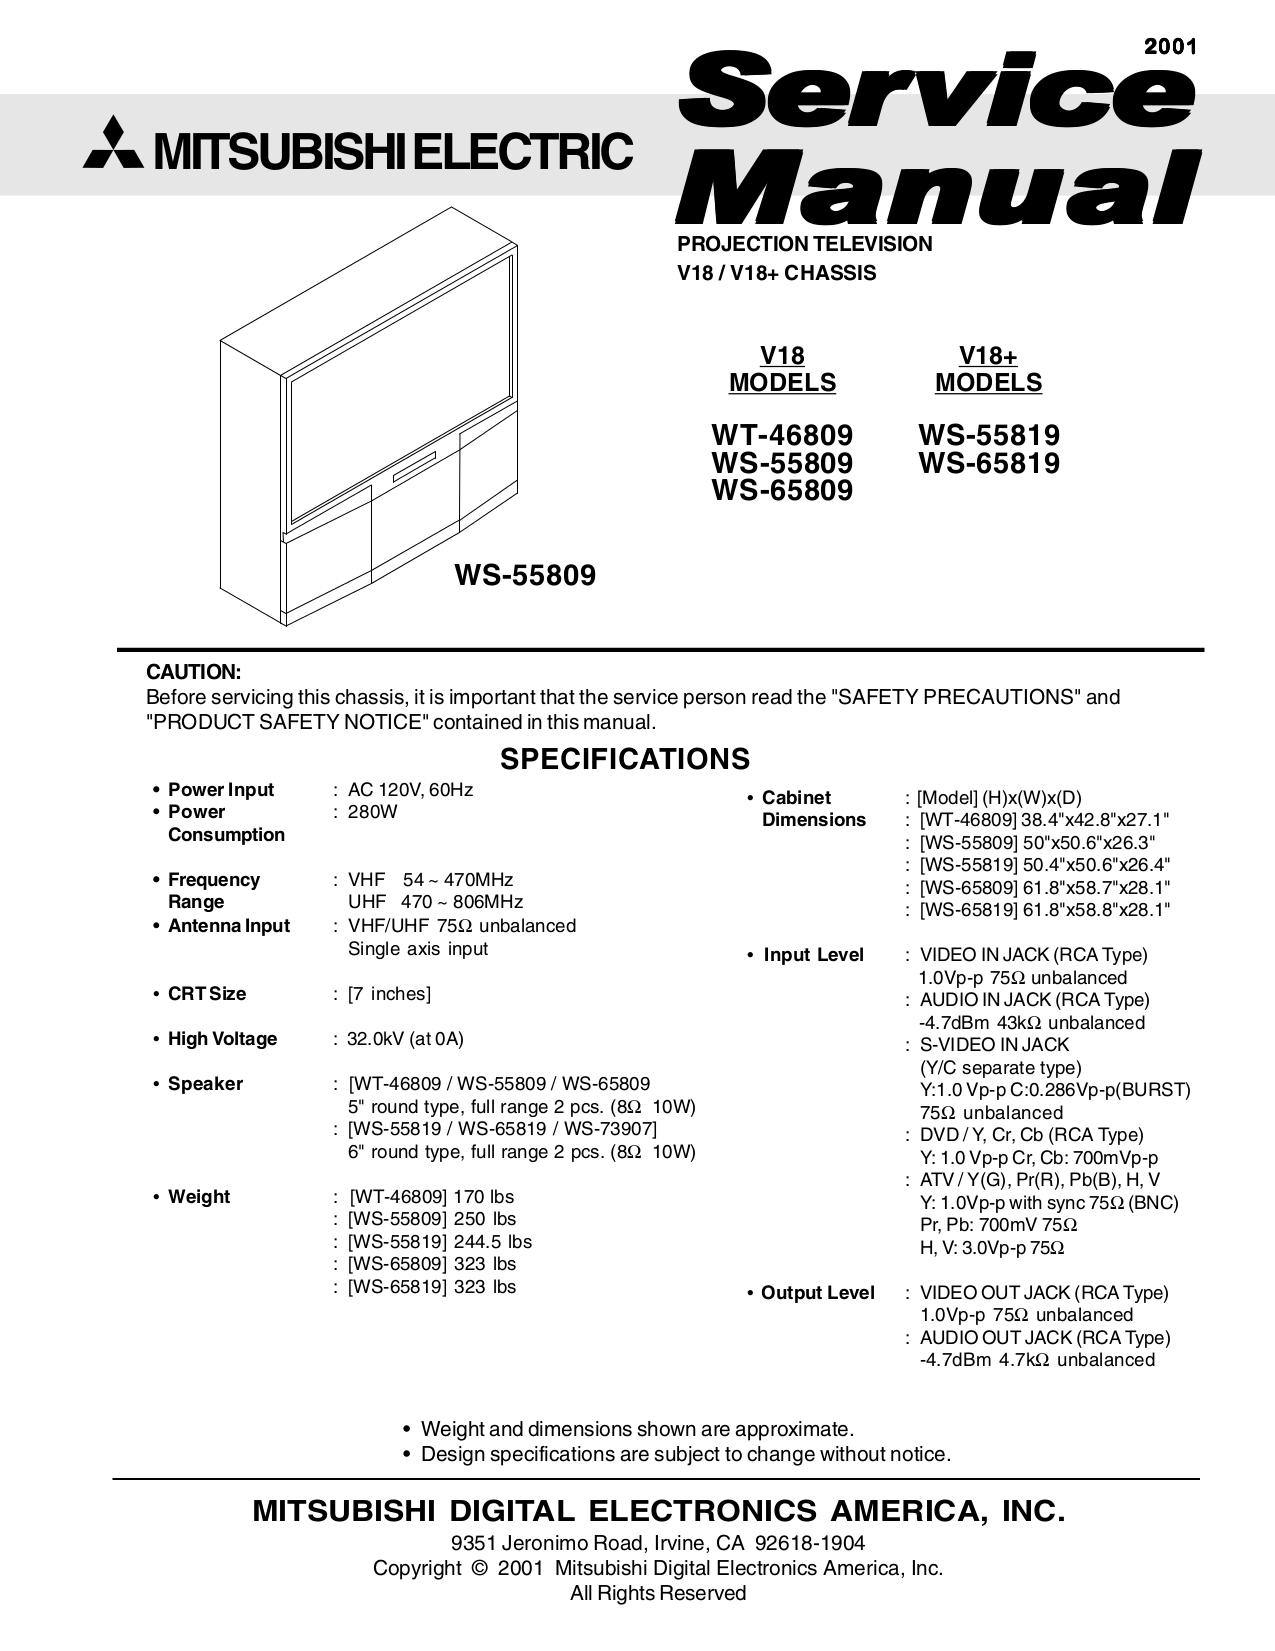 pdf for Mitsubishi TV WS-65809 manual